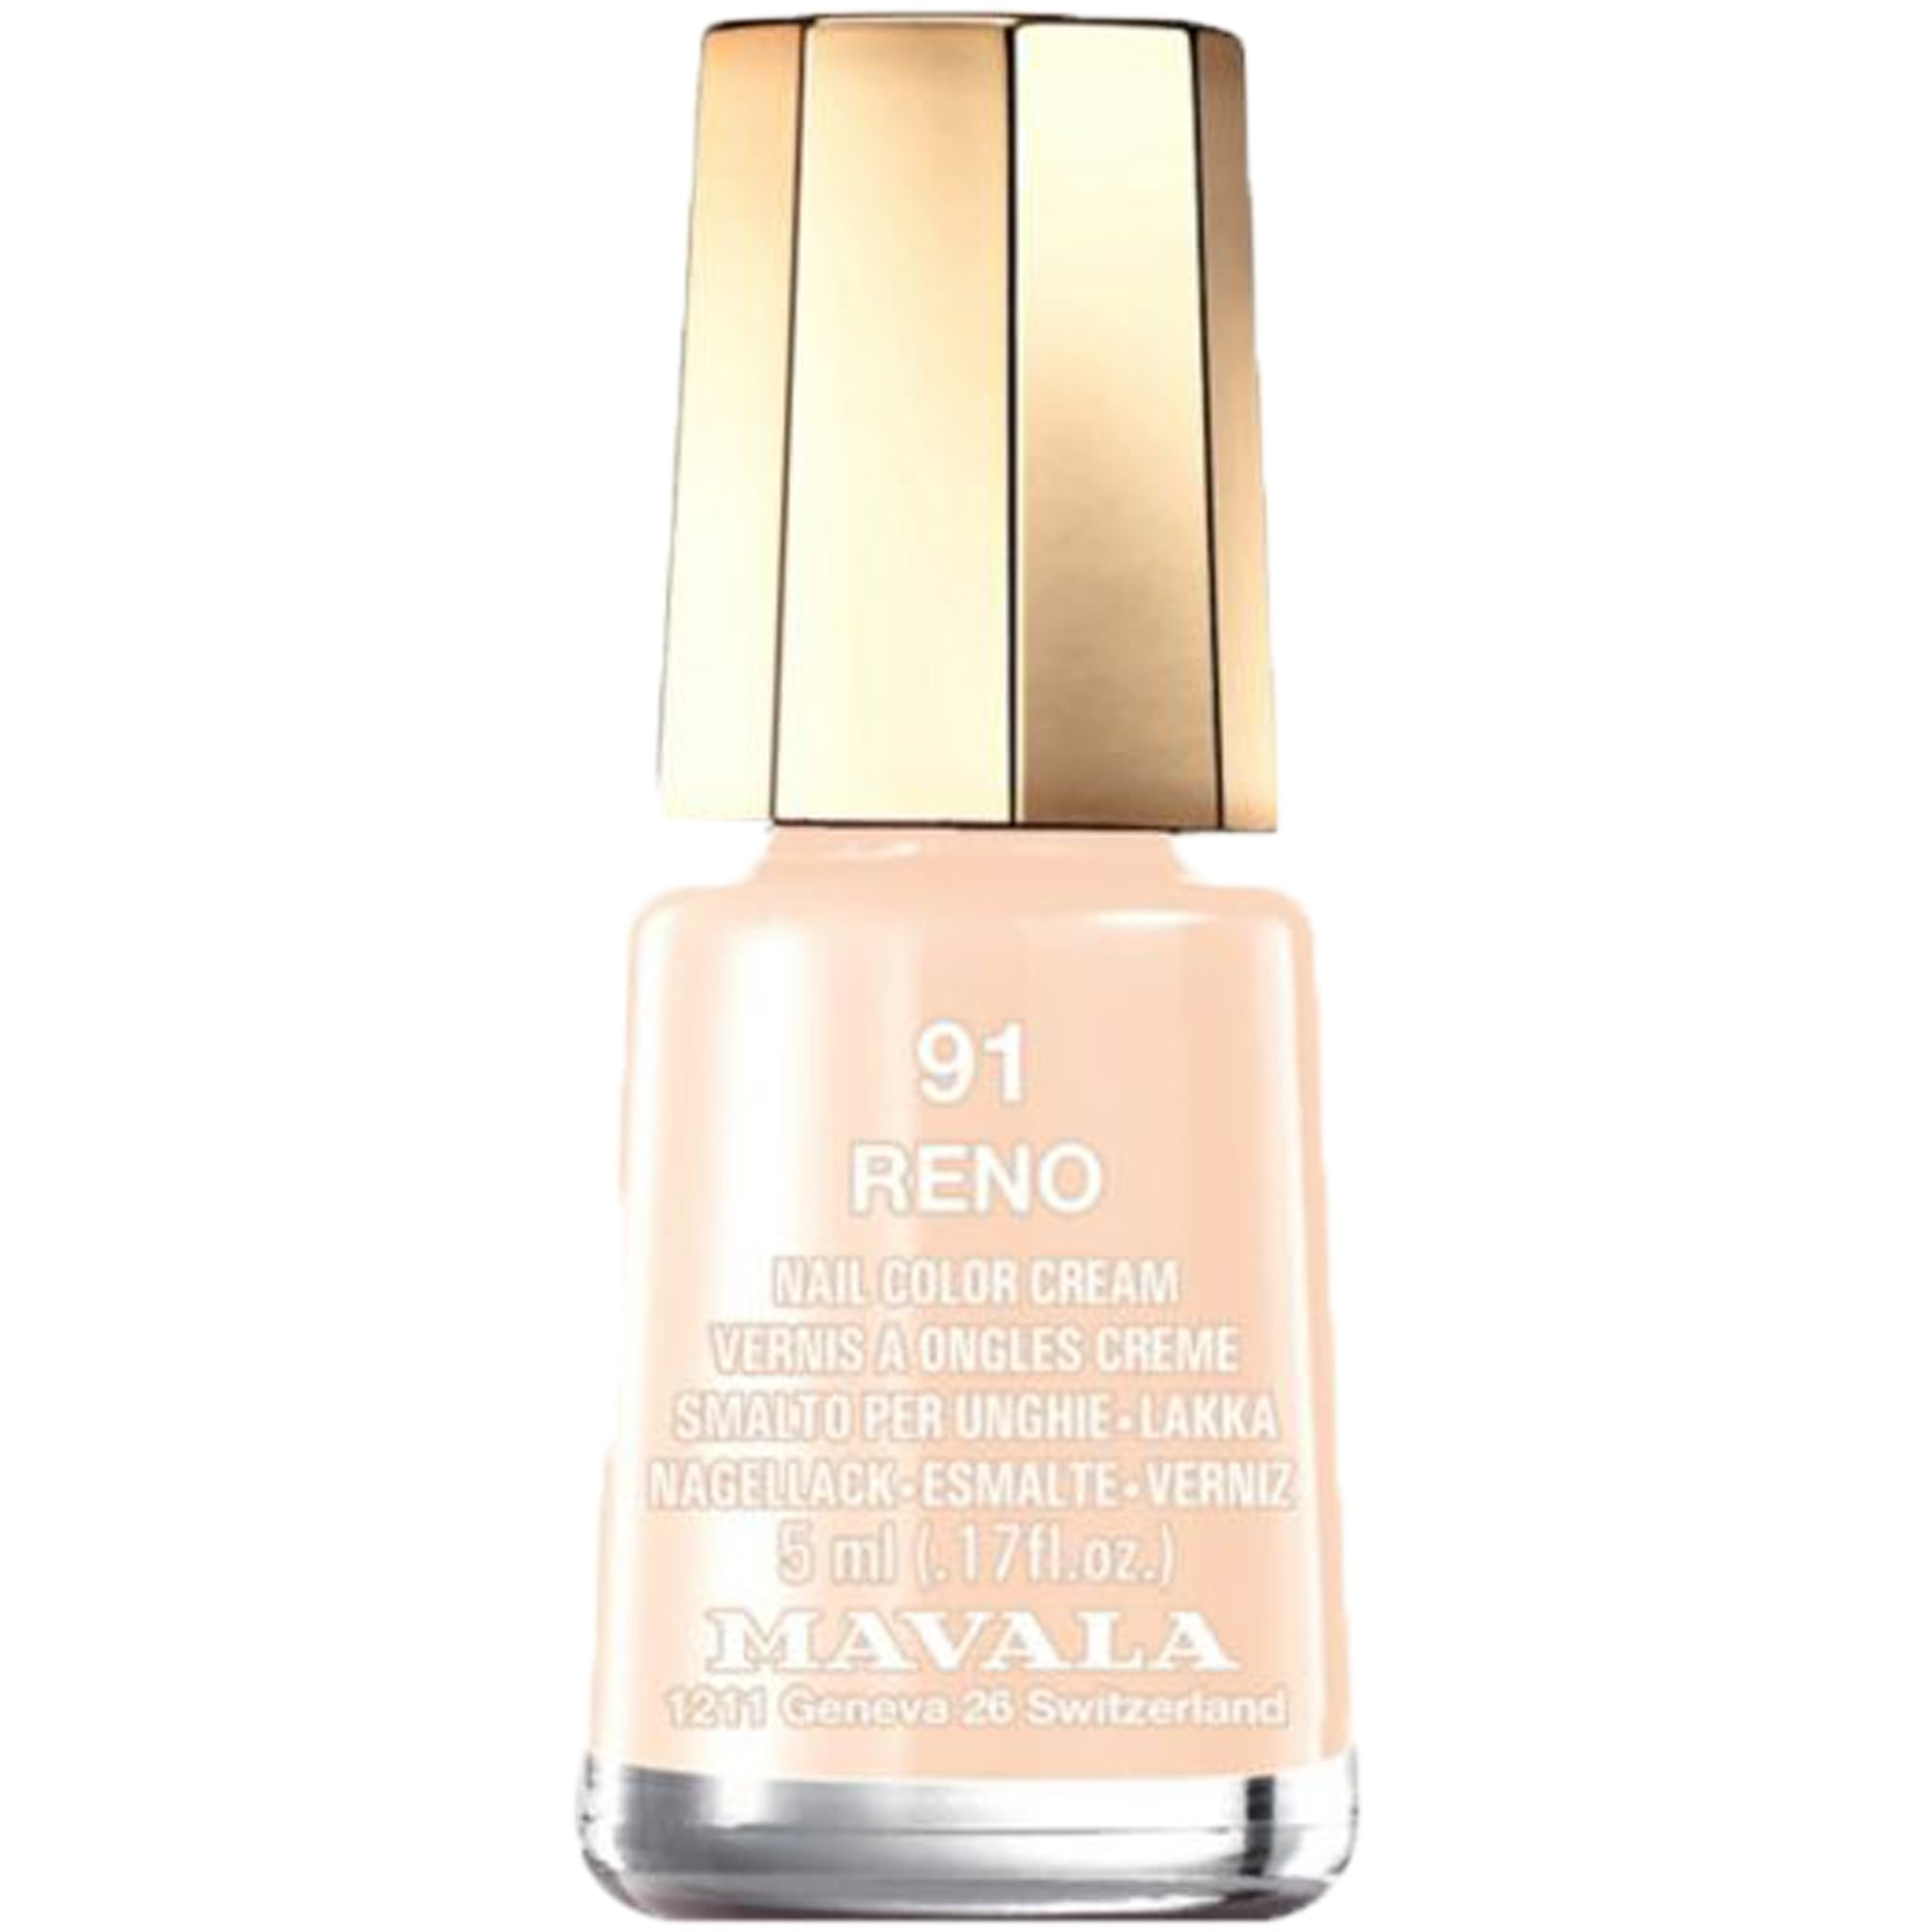 Mini Color Creme Effect Nail Polish - Reno (91) 5ml